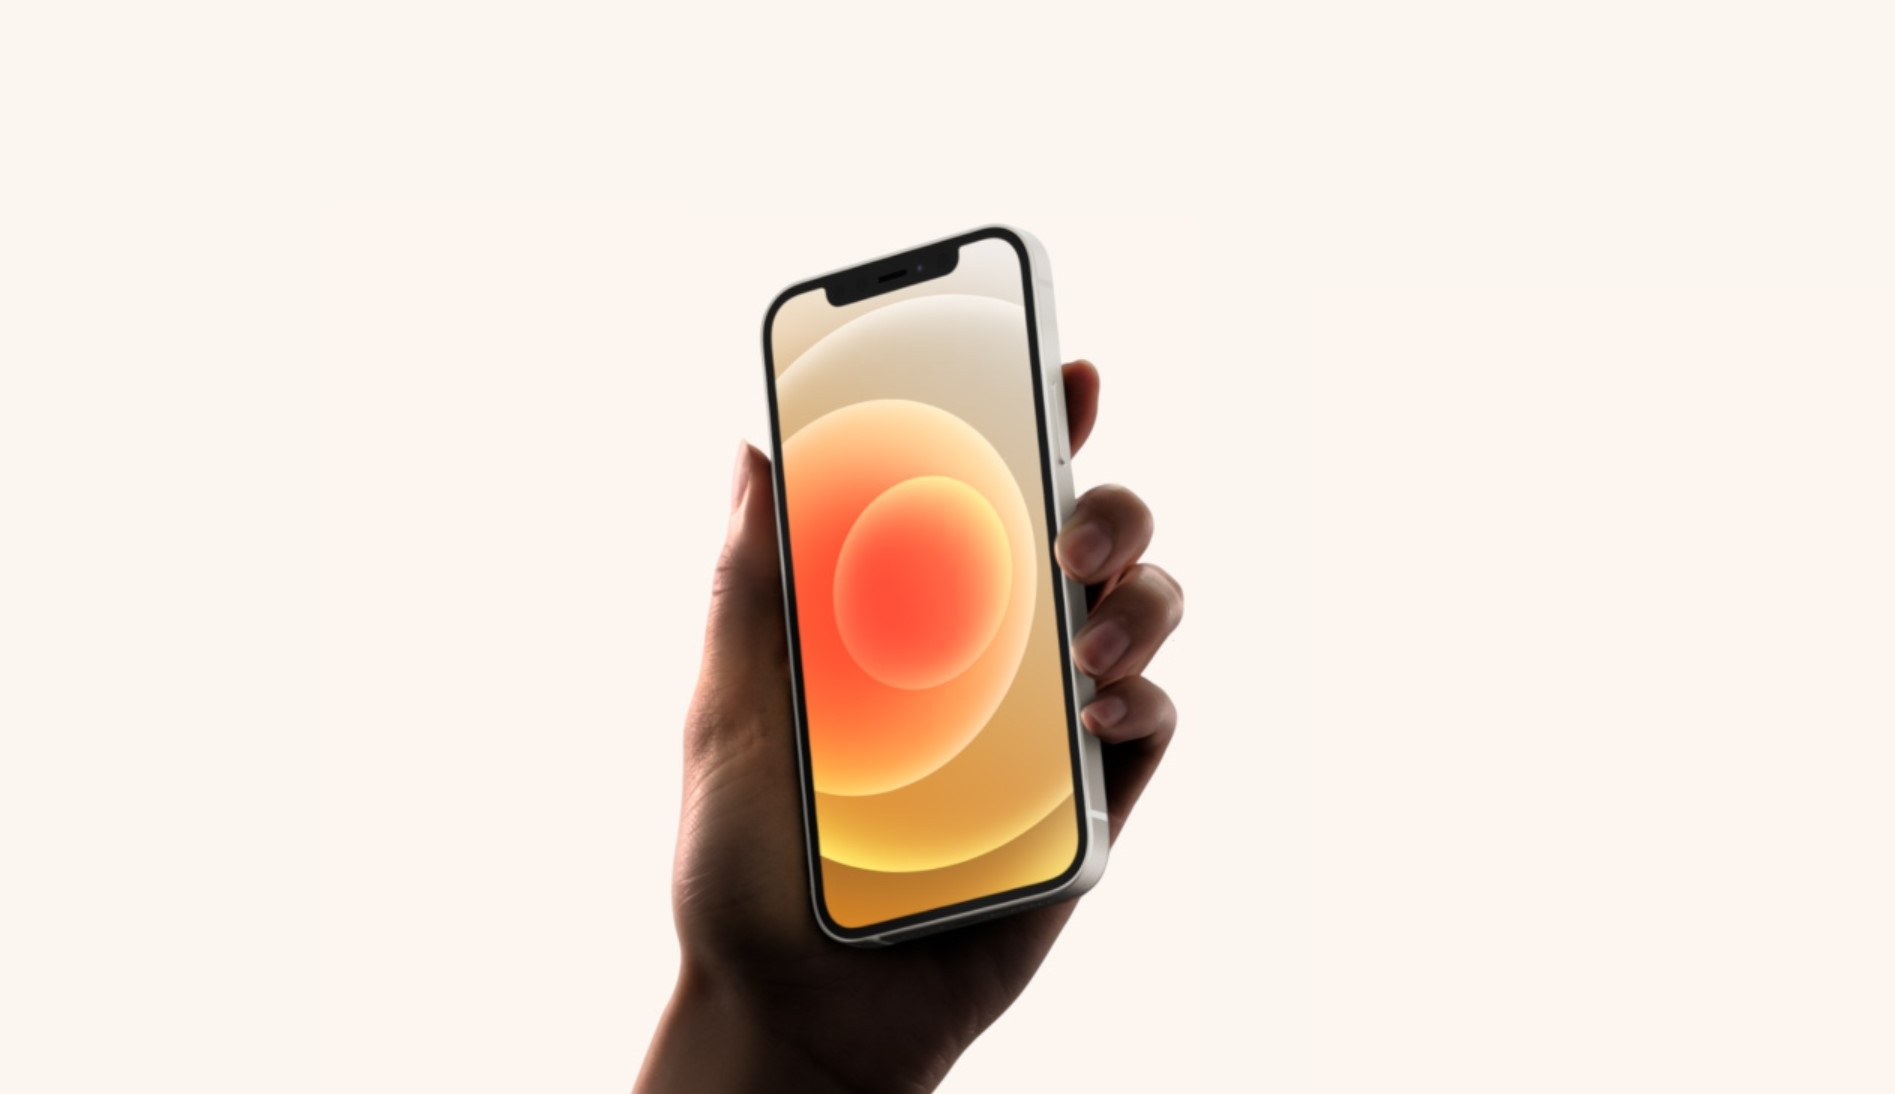 iphone 12 vs iPhone 8